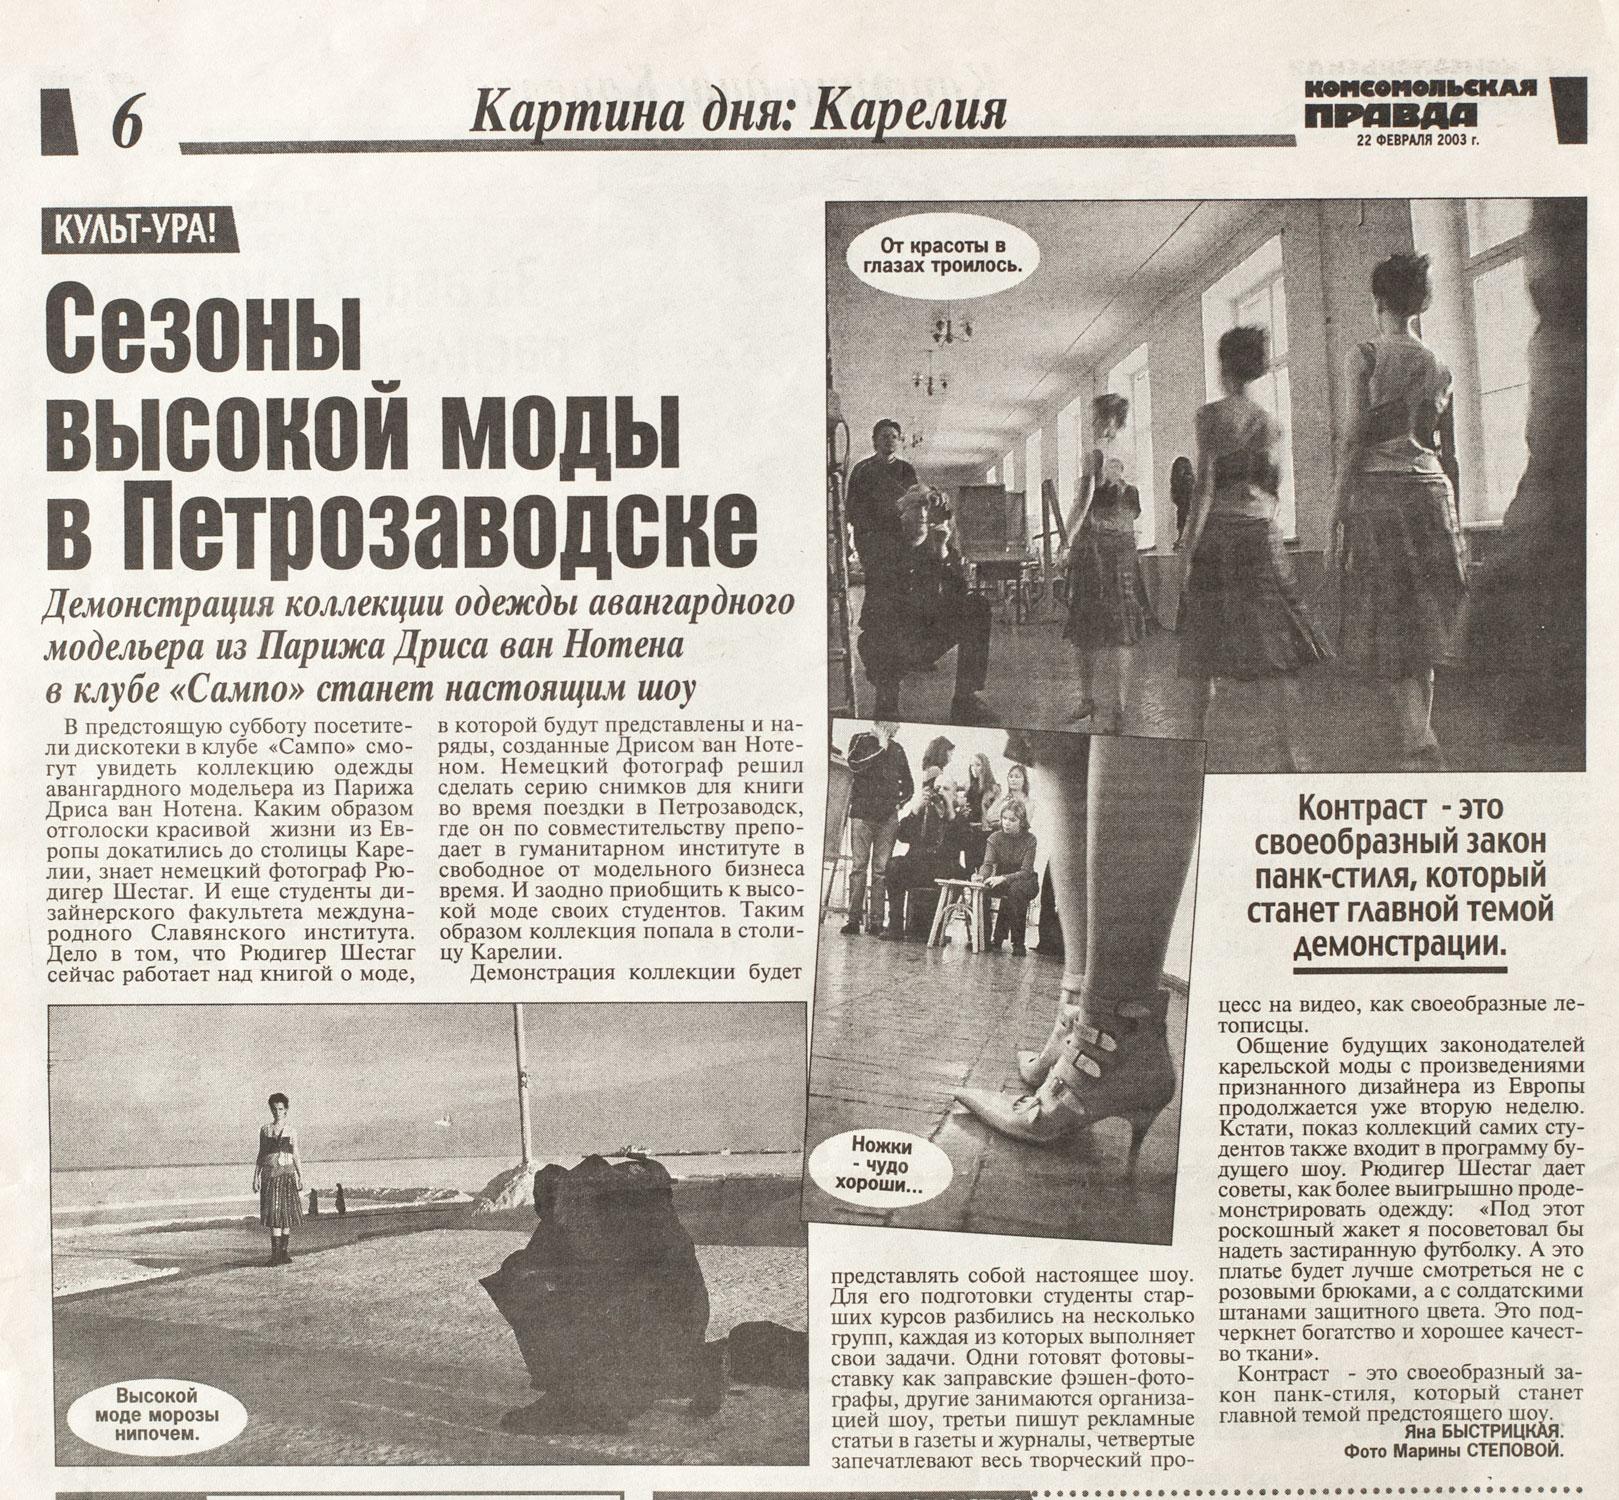 200302-komsomolskaja-prawda_ru